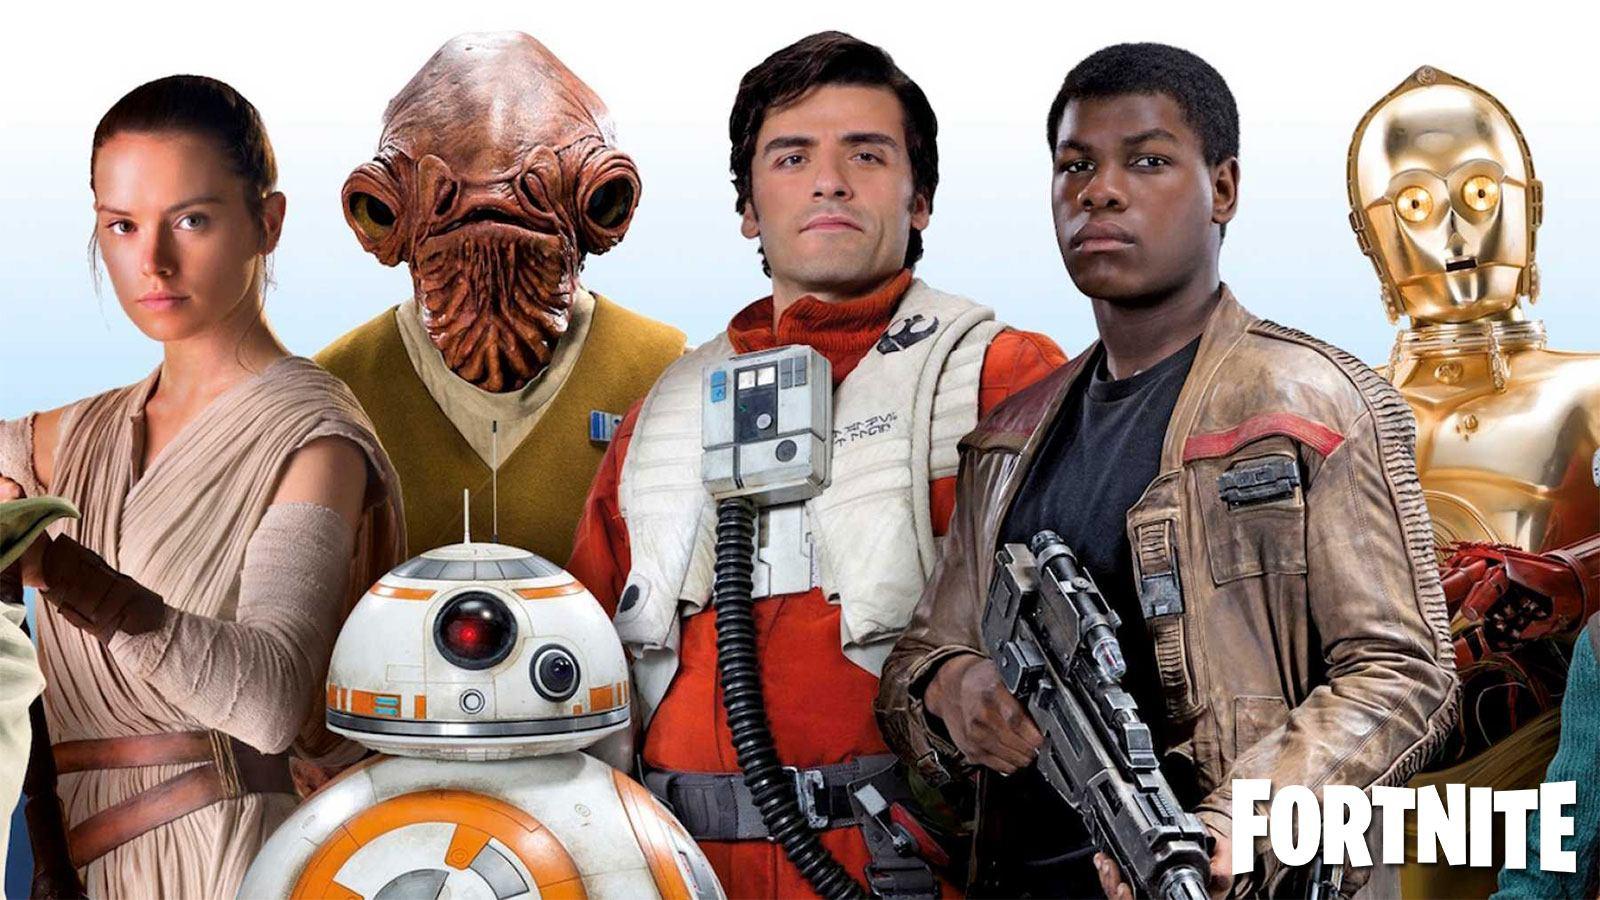 Personnages de Star Wars dans Fortnite